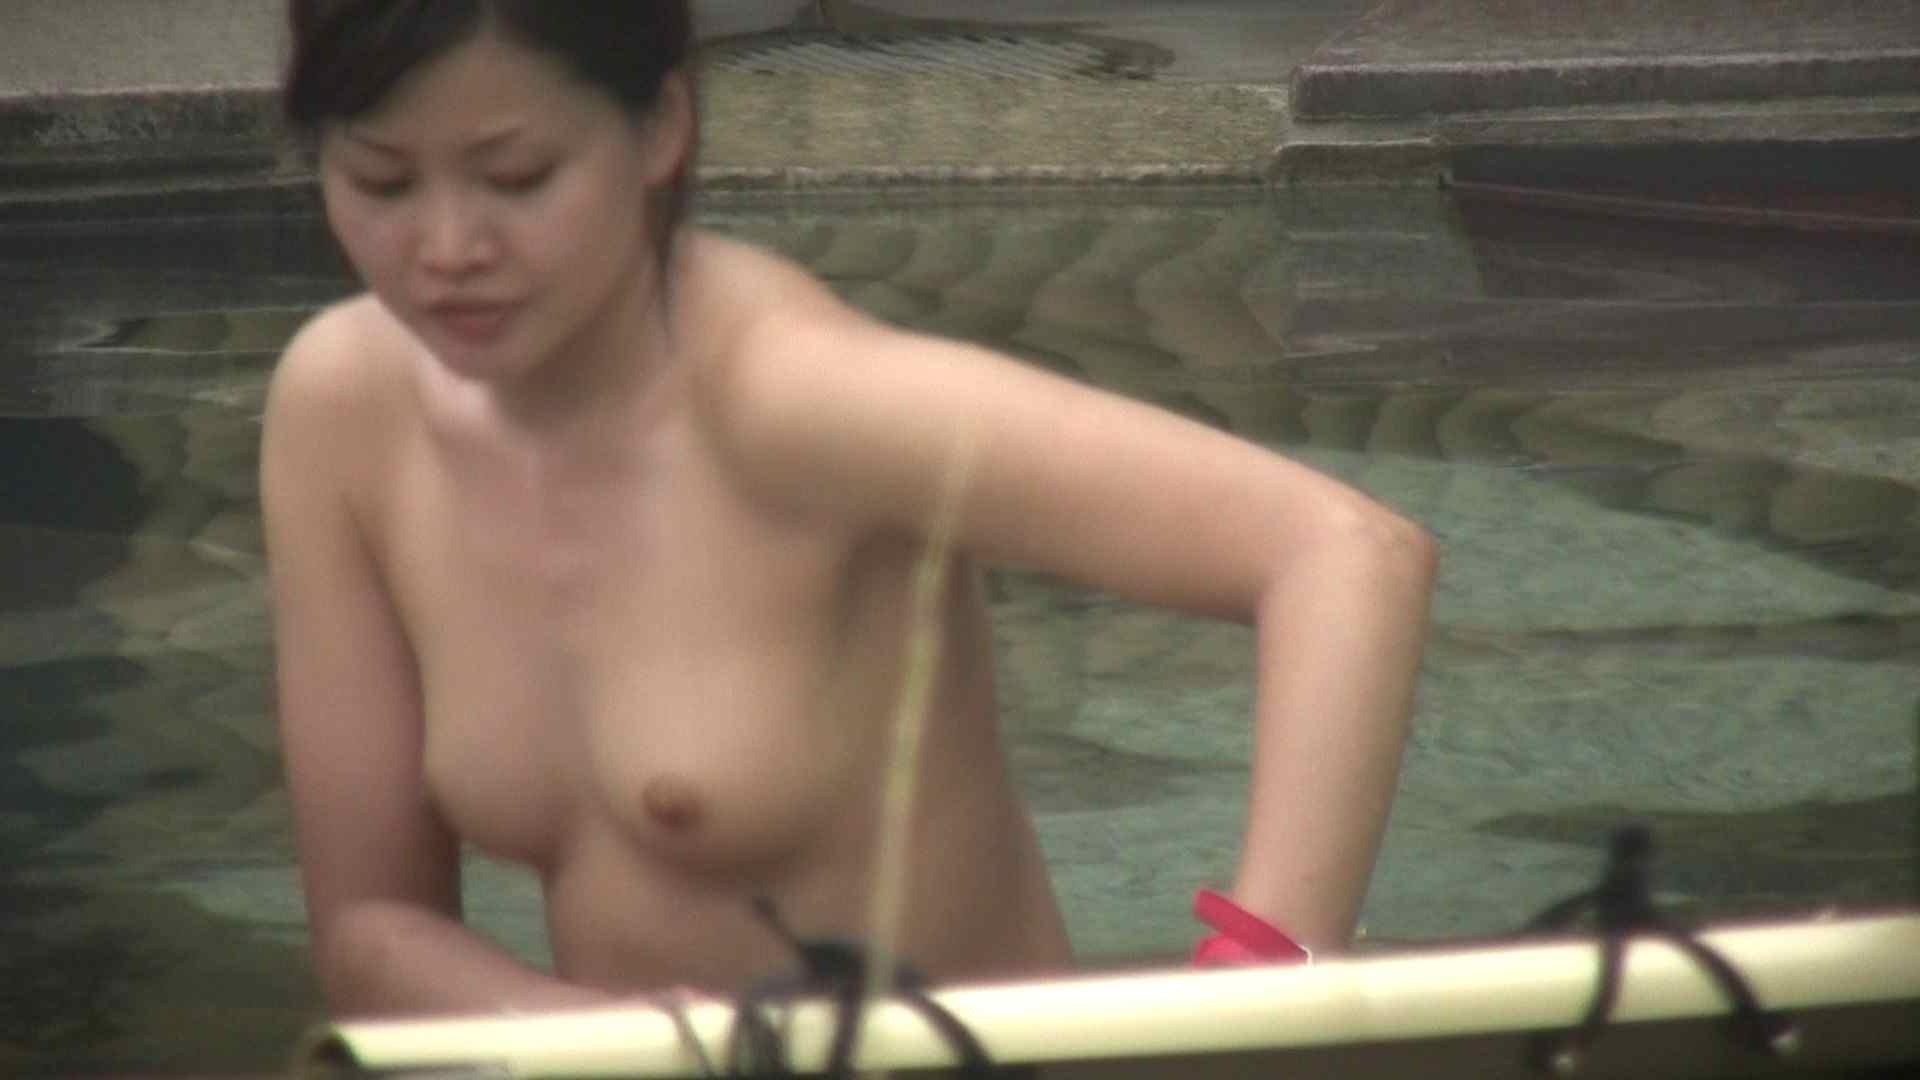 Aquaな露天風呂Vol.125 盗撮映像  22Pix 8